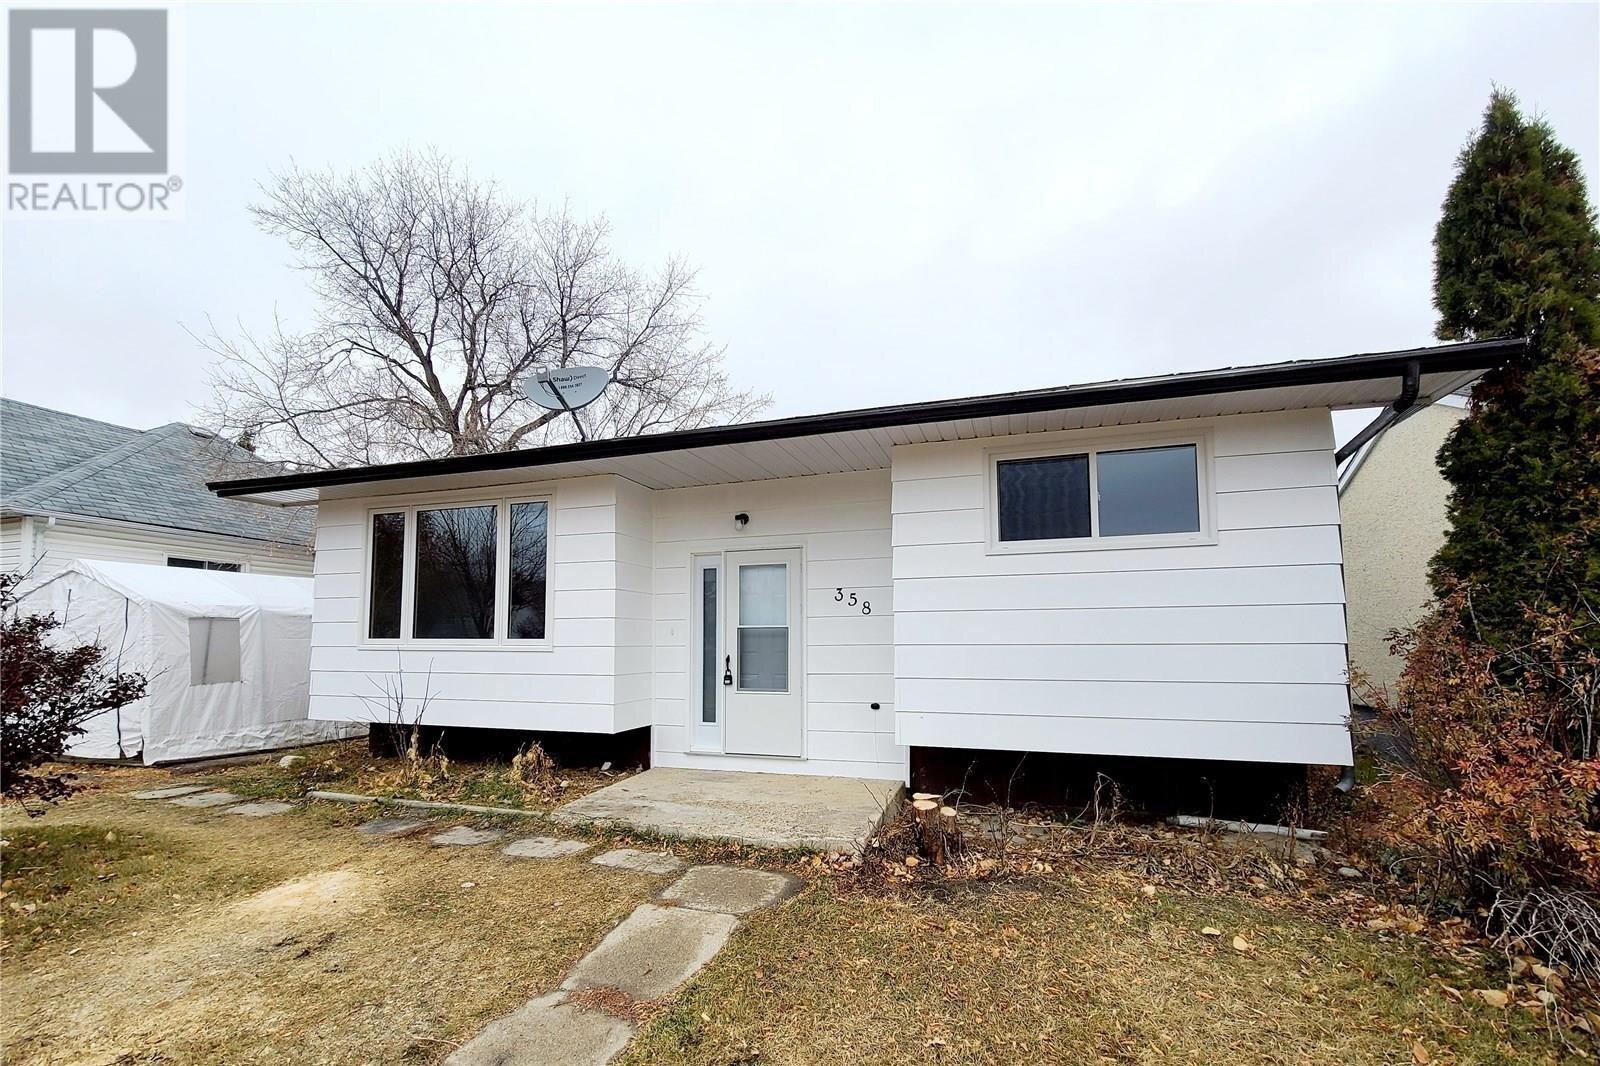 House for sale at 358 6th Ave E Melville Saskatchewan - MLS: SK834799